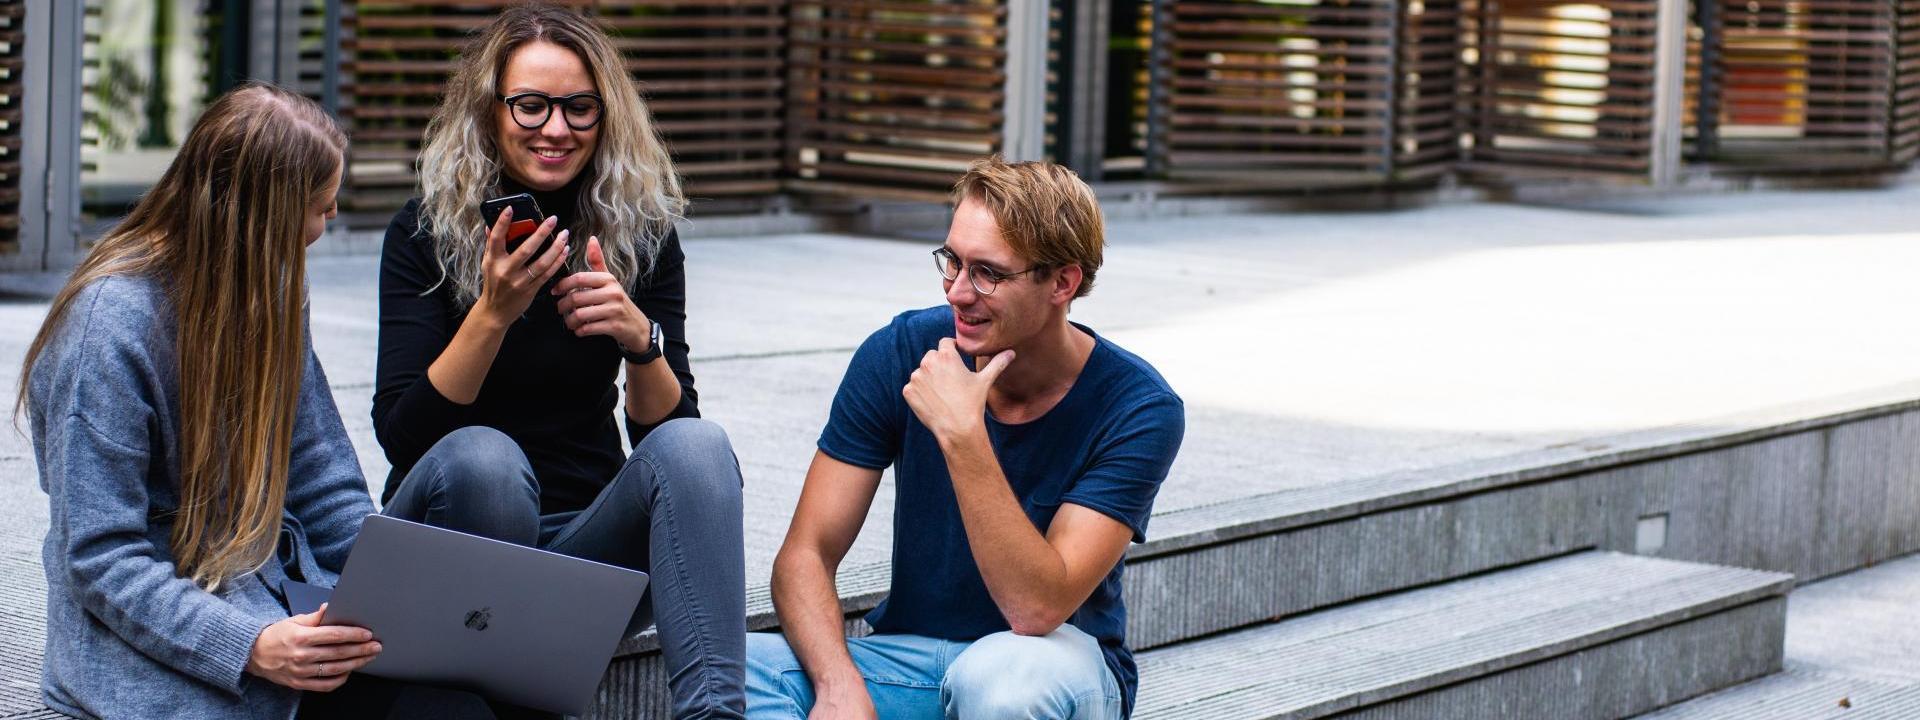 3 students talking